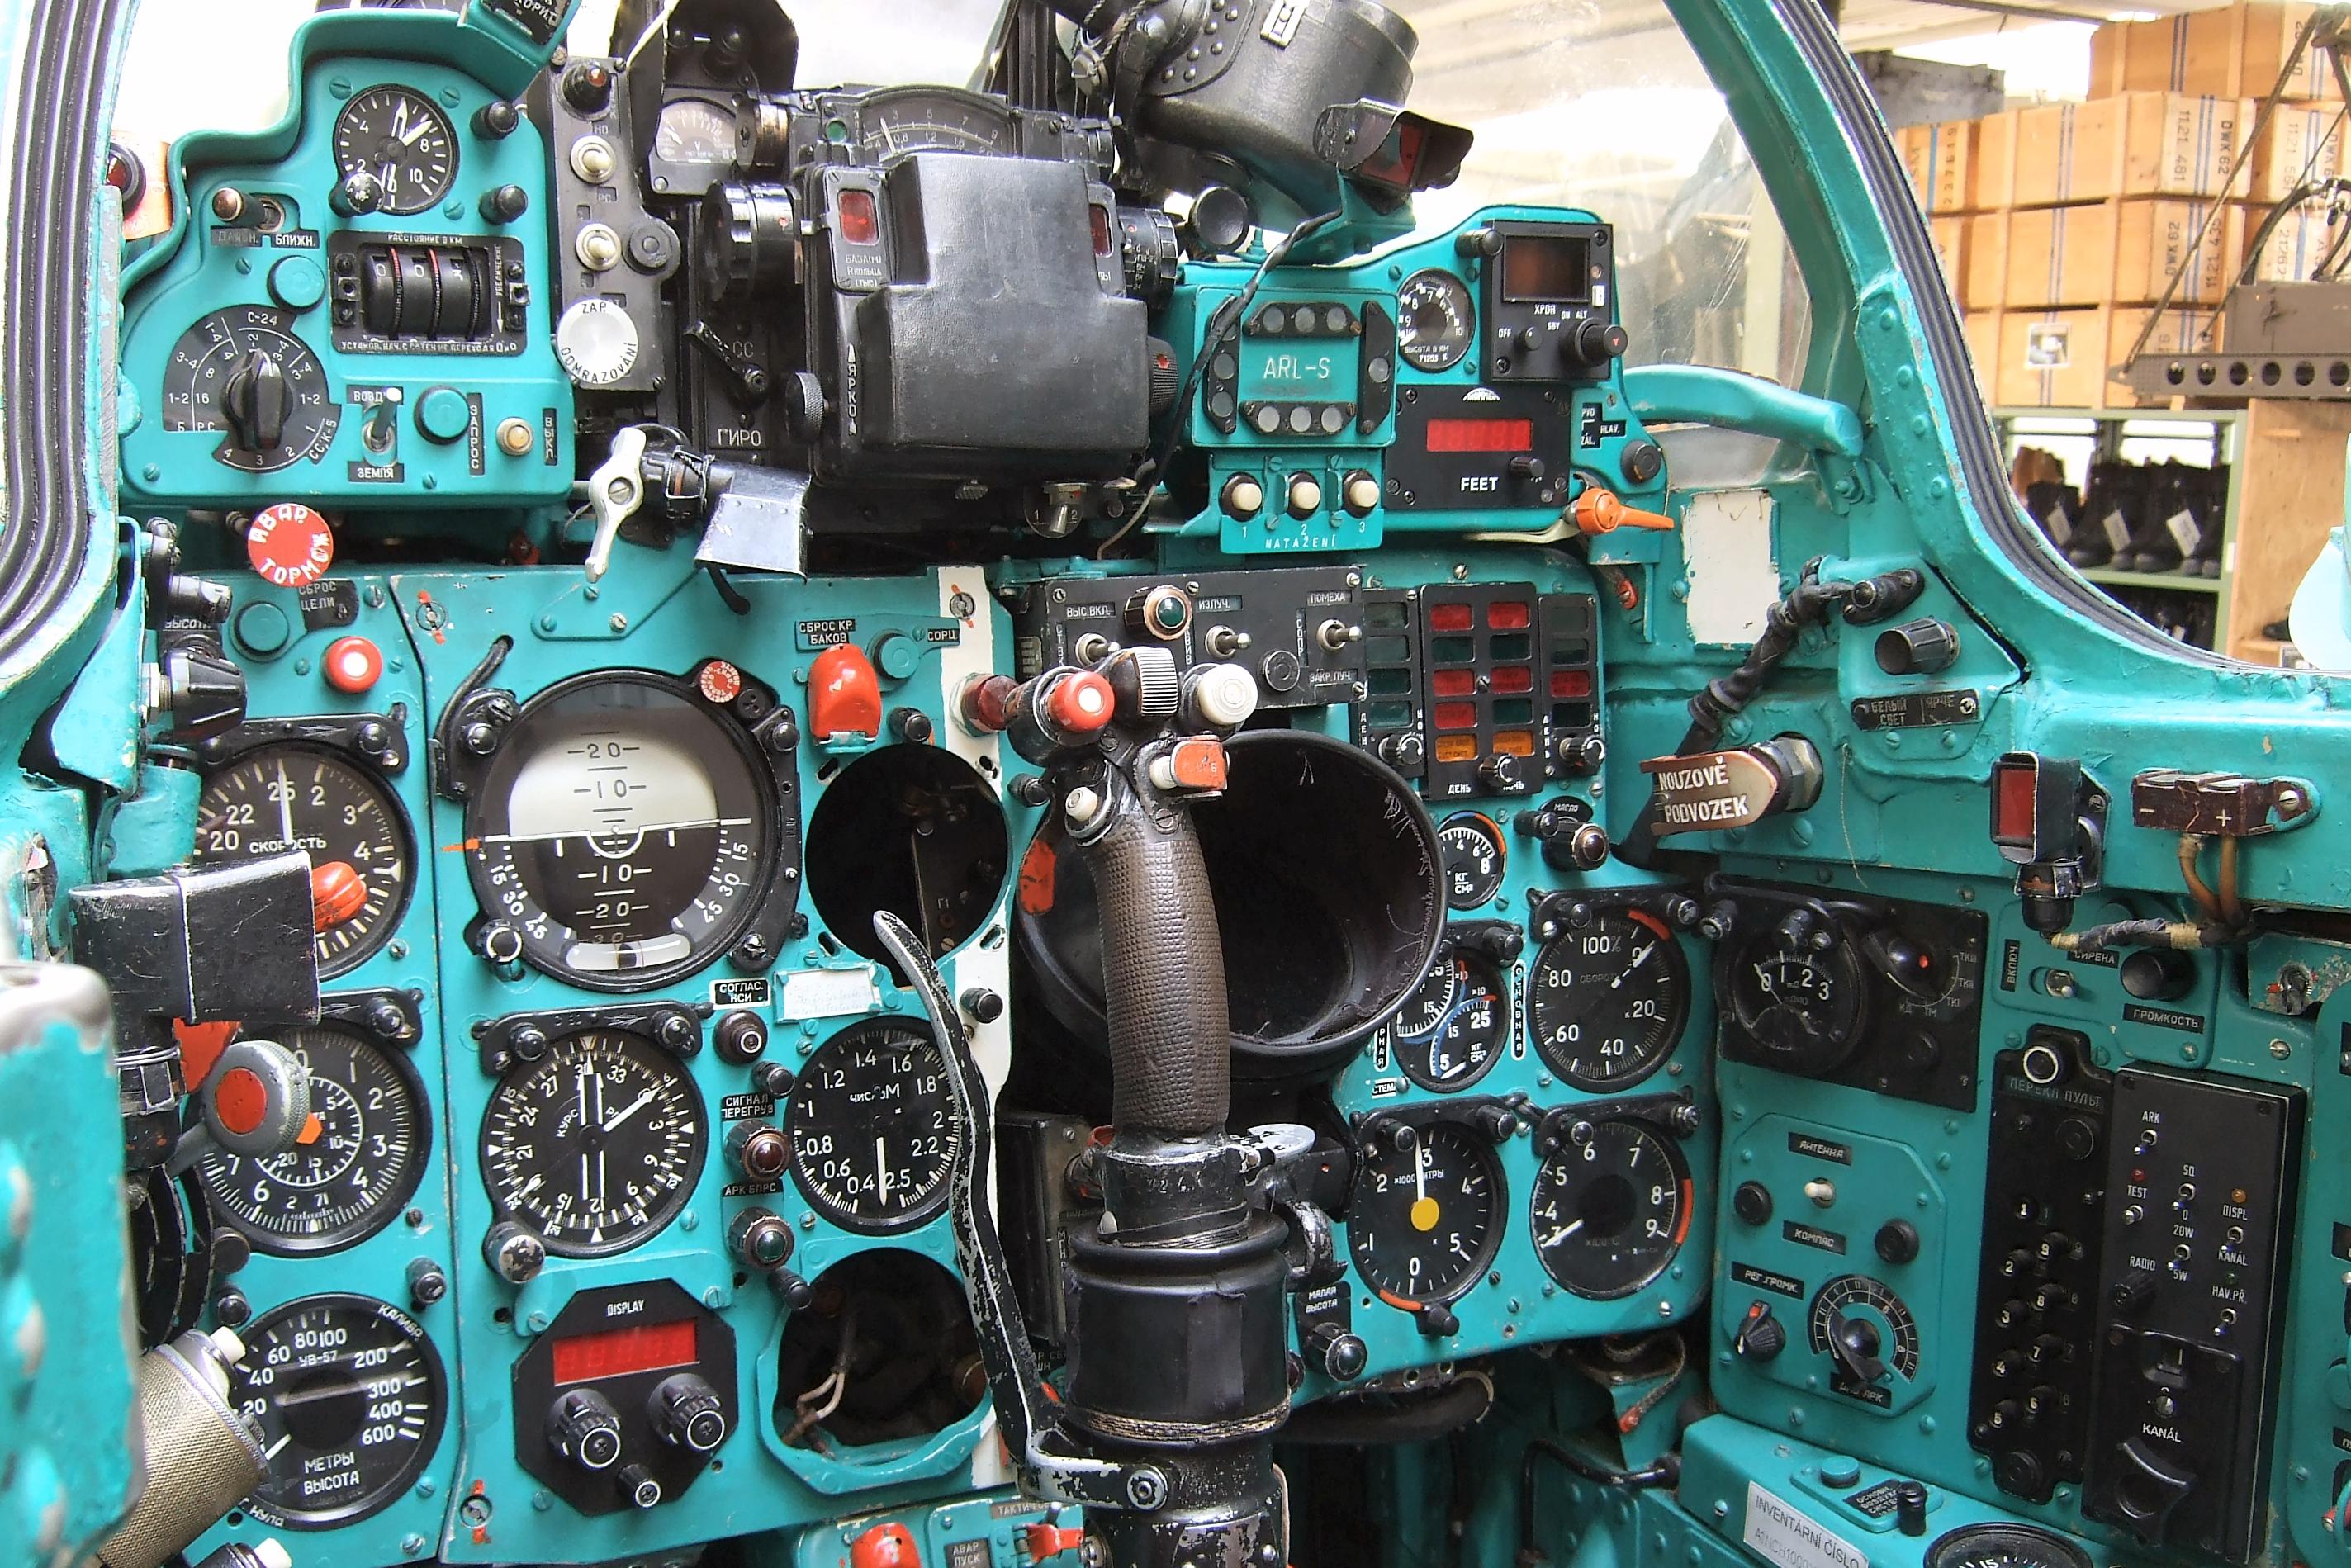 Cockpit_of_a_MiG-21MF.jpg